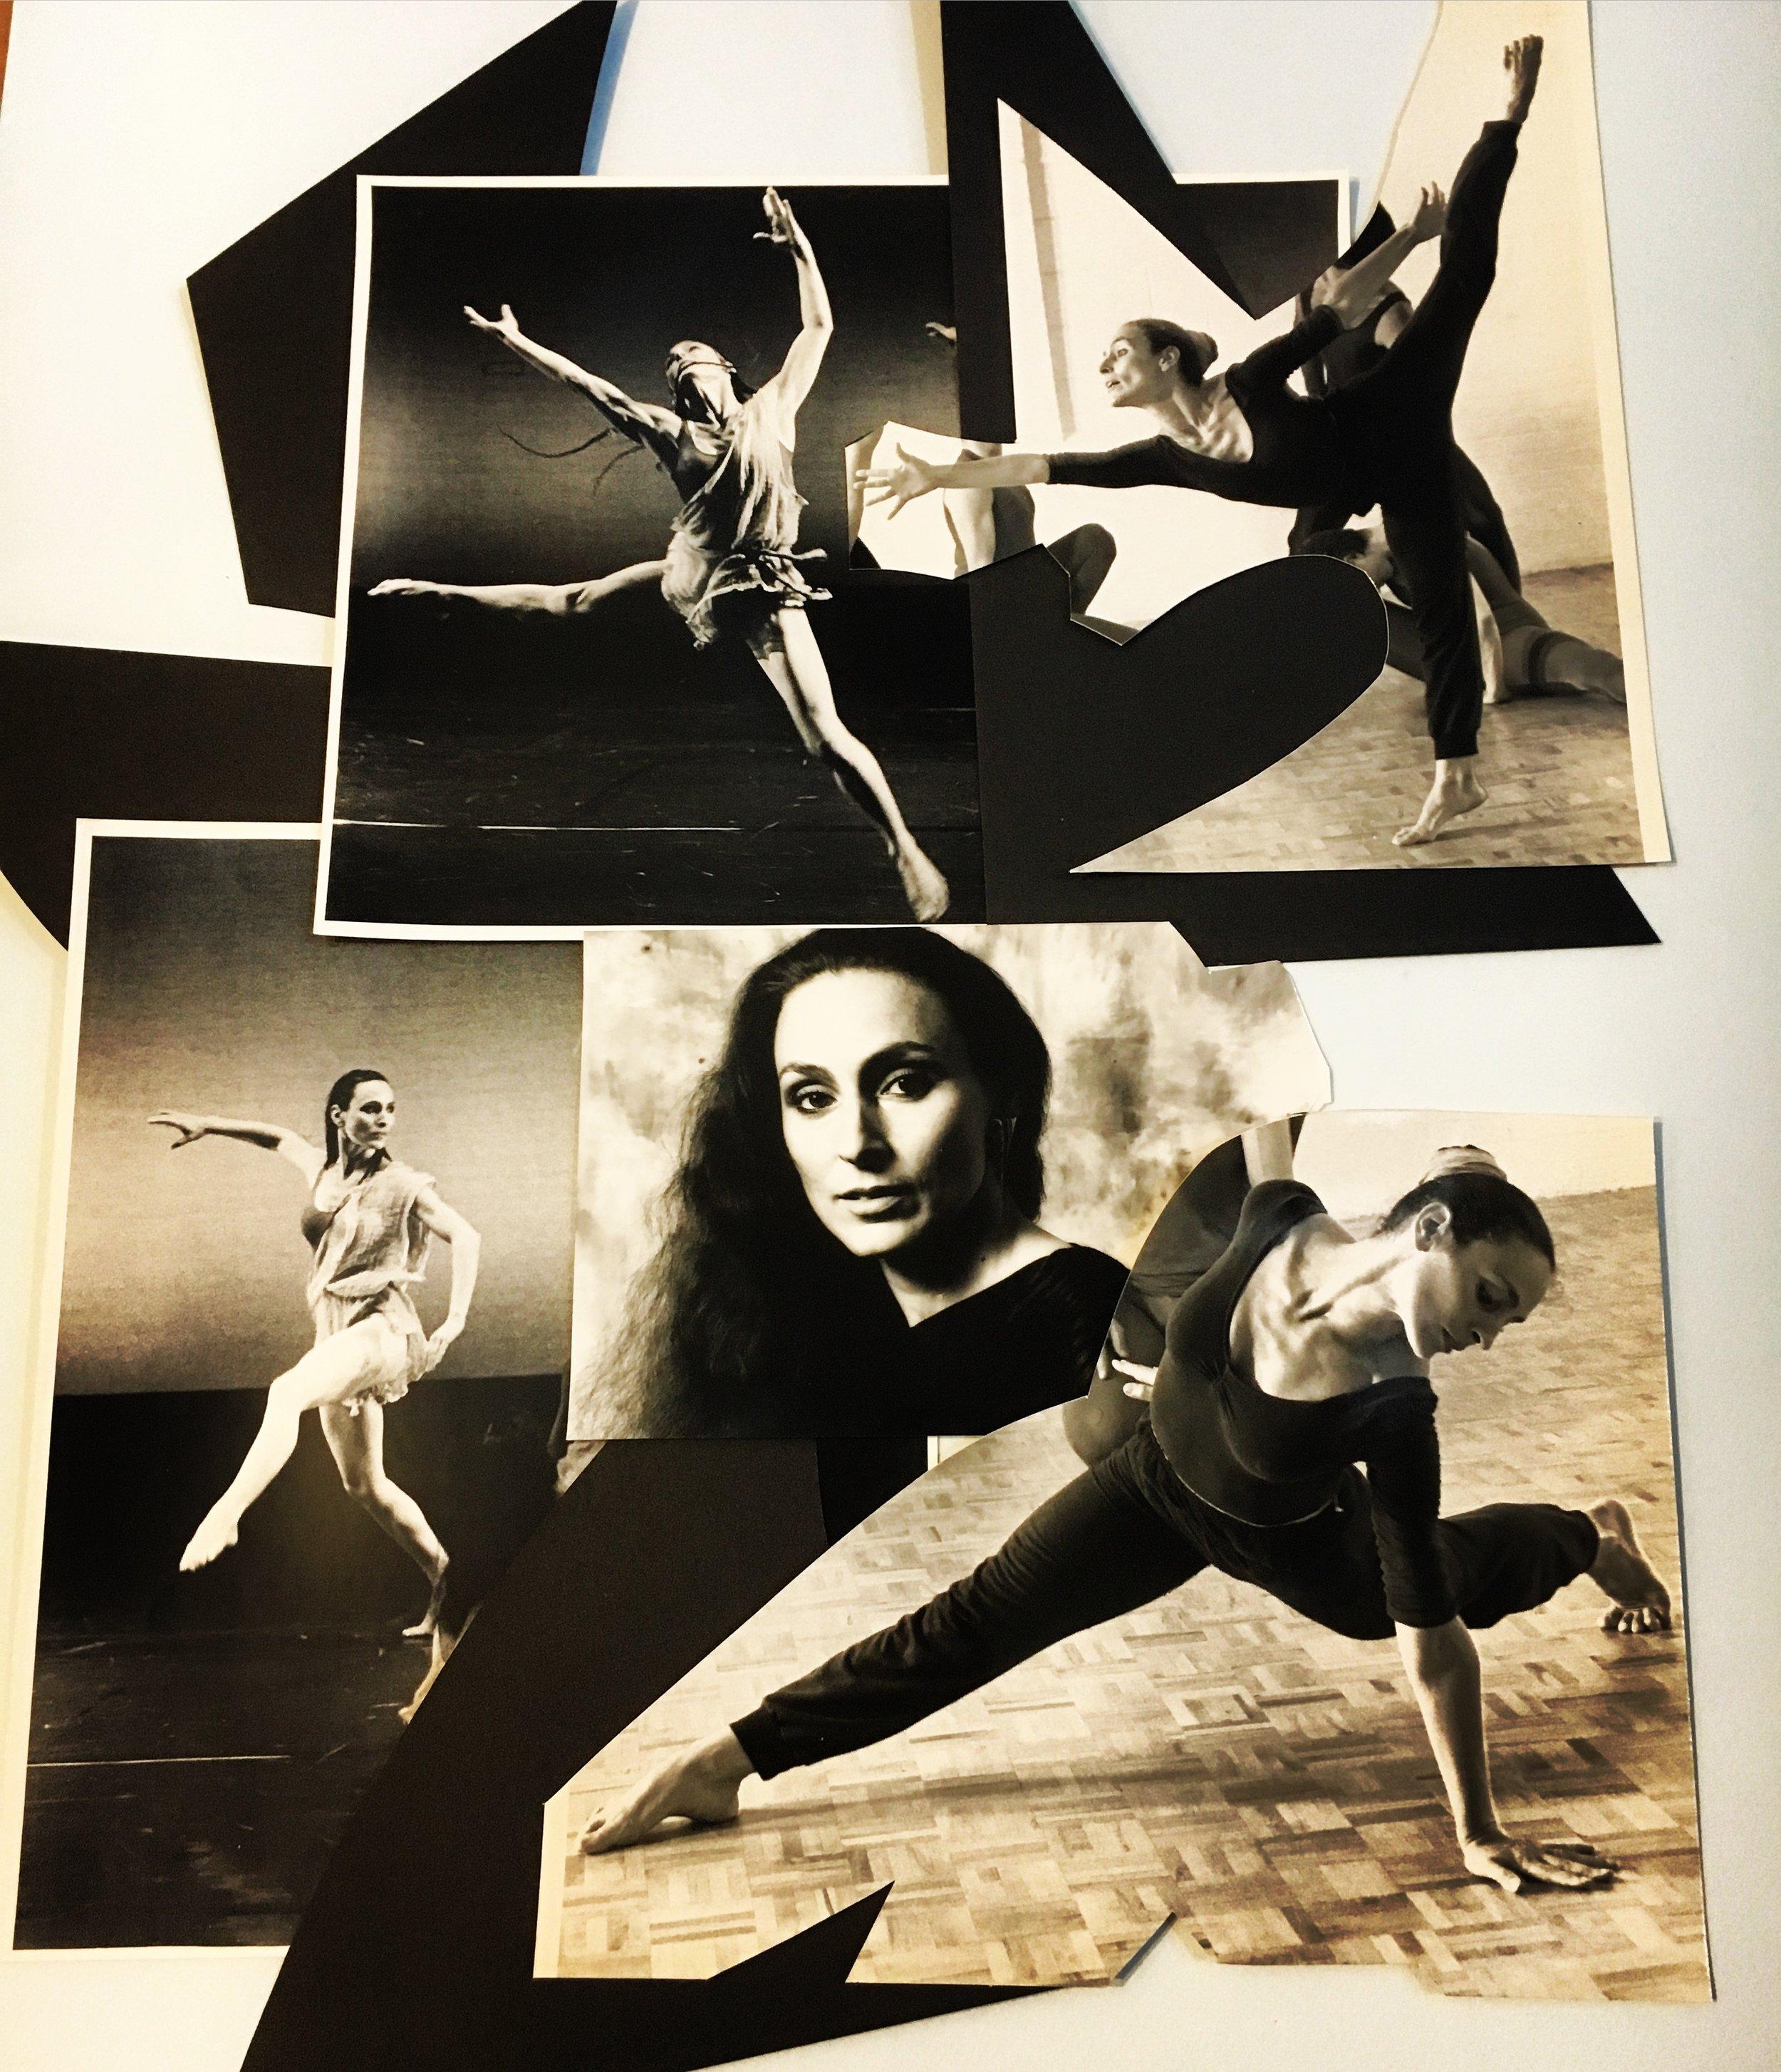 Photos: Cylla Von Tiedemann & Alex Newmann Choreography: Milton Myers & Terill Maguire